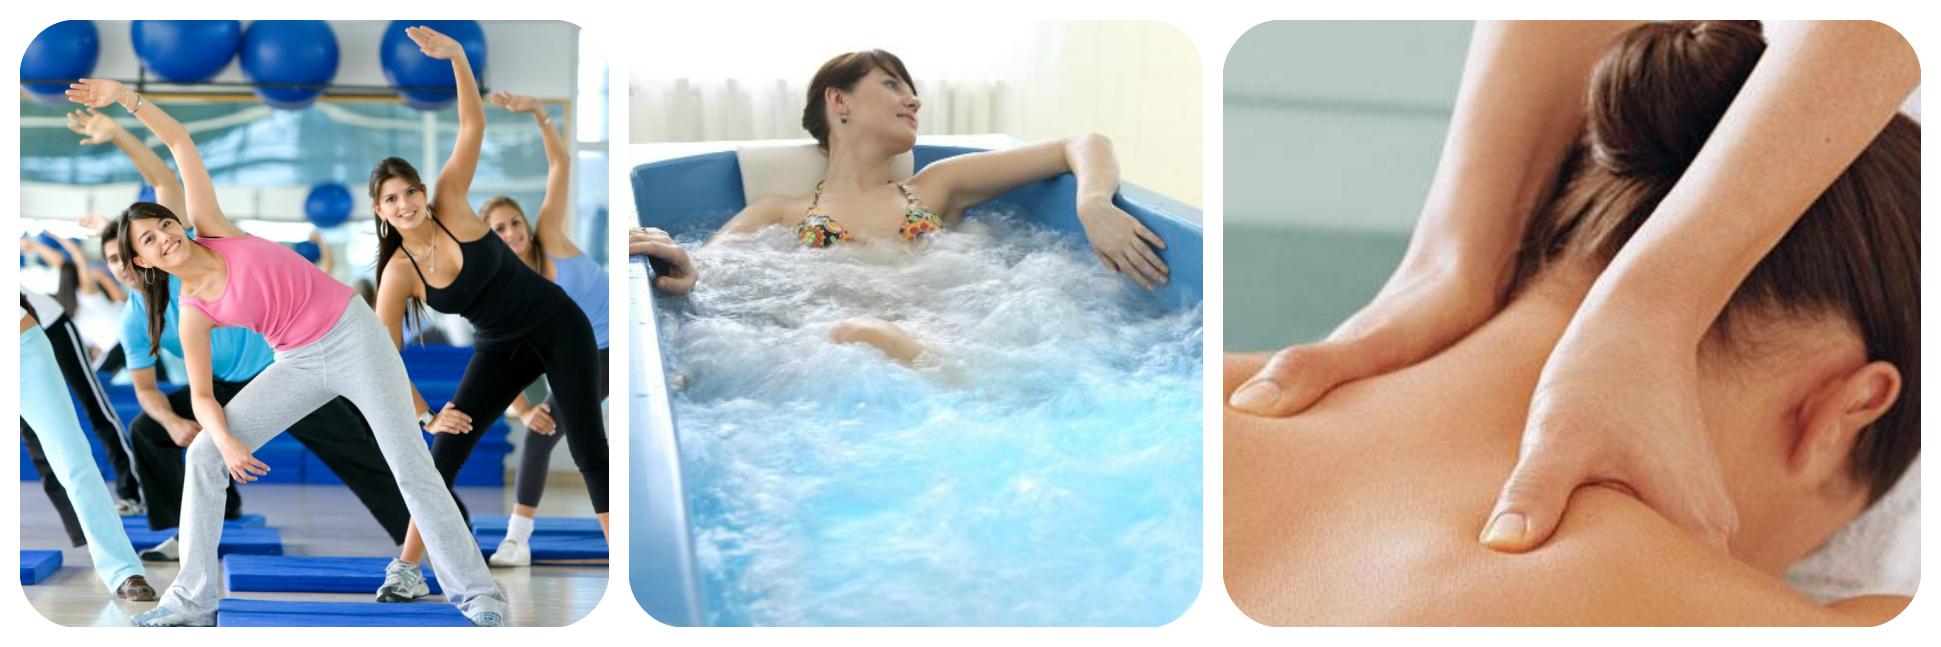 кислородная ванна, ЛФК, массаж